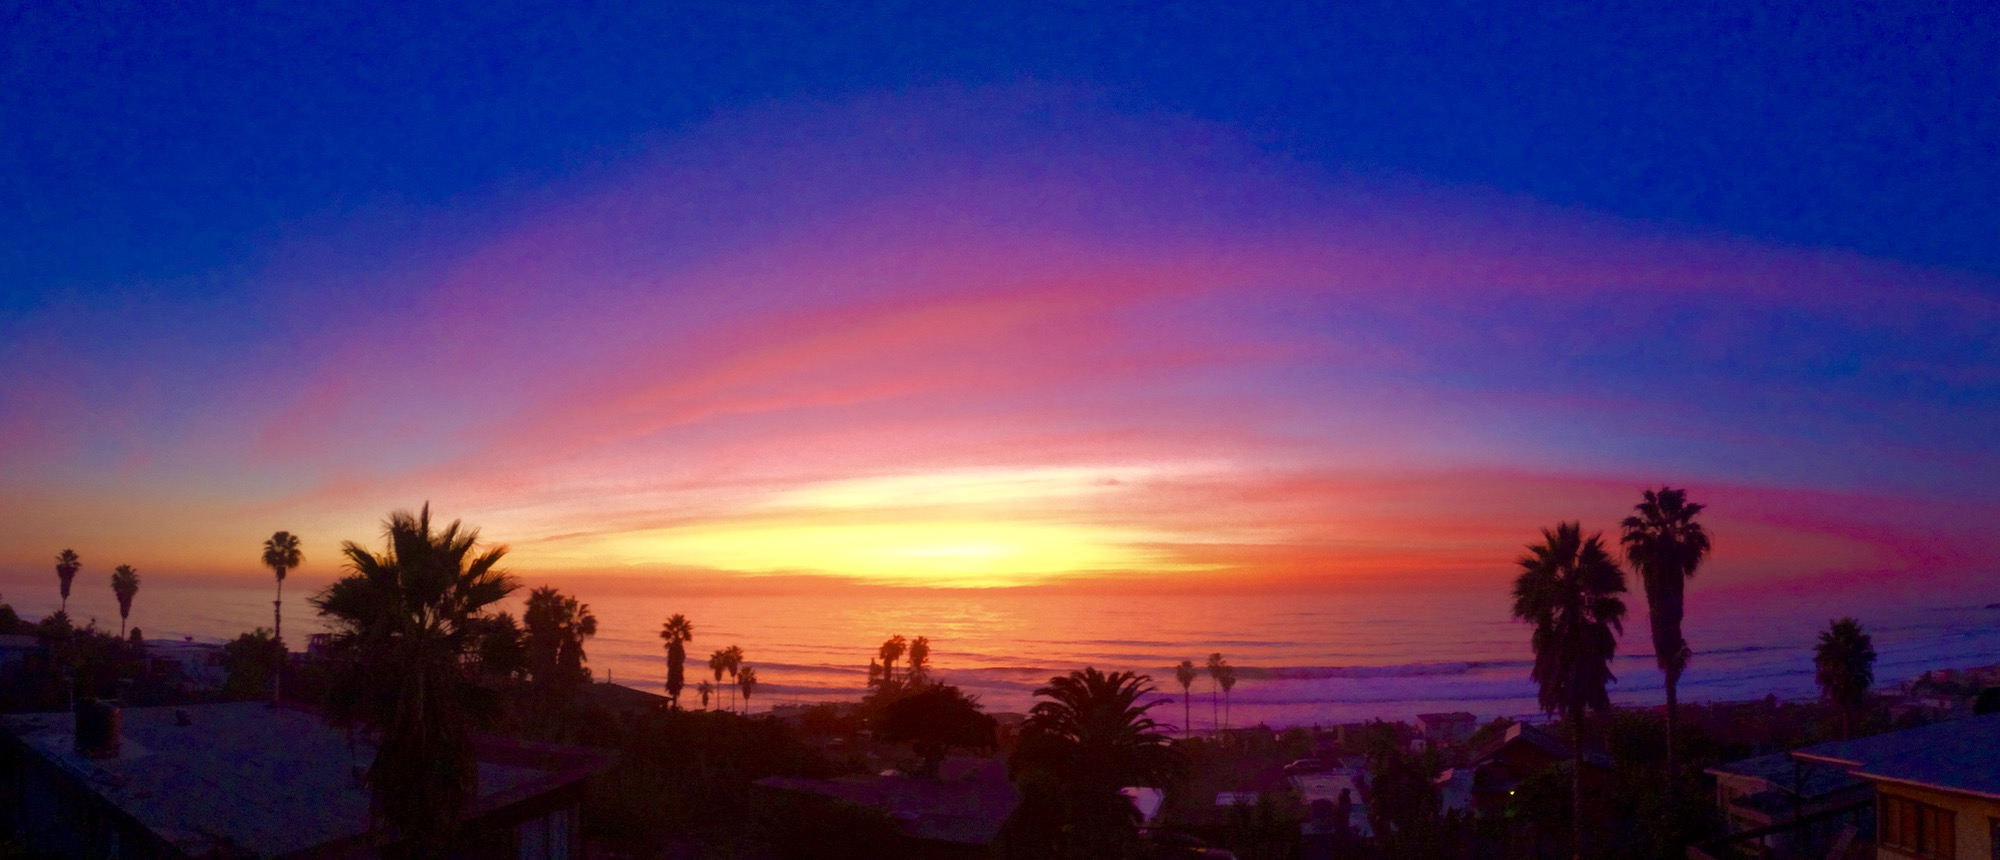 Sunset in Baja California Mexico